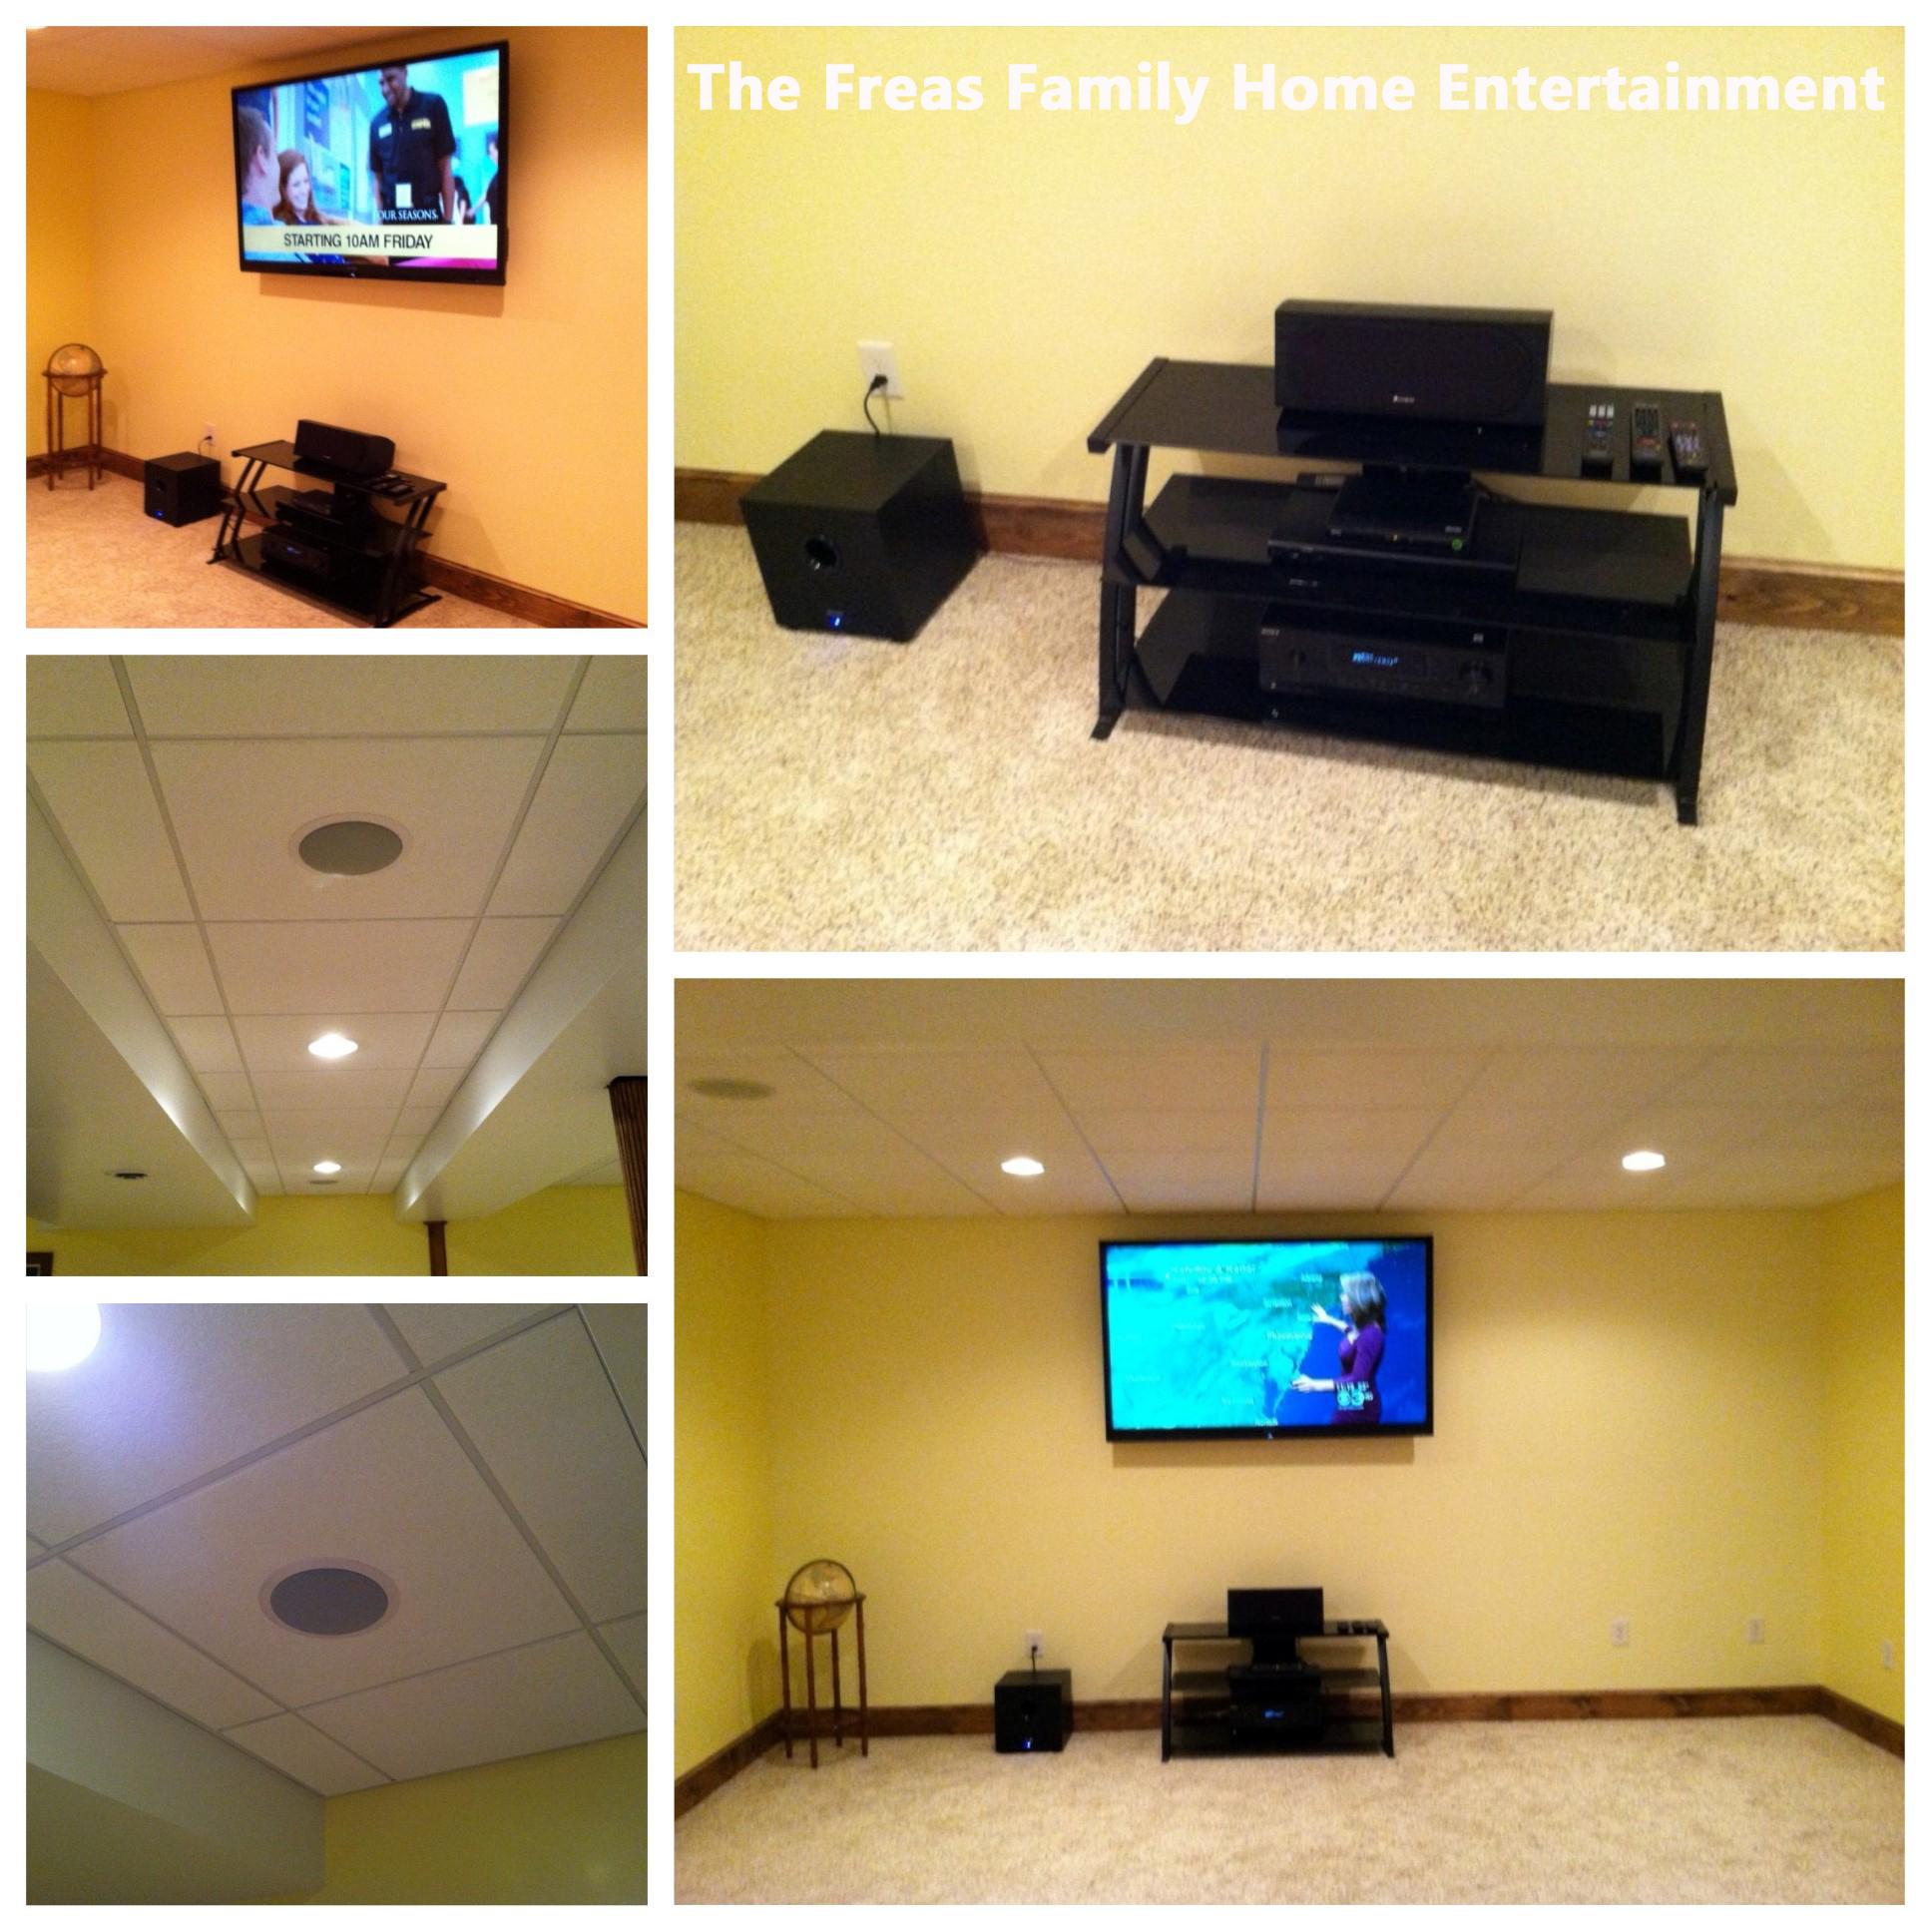 Freas home entertainment